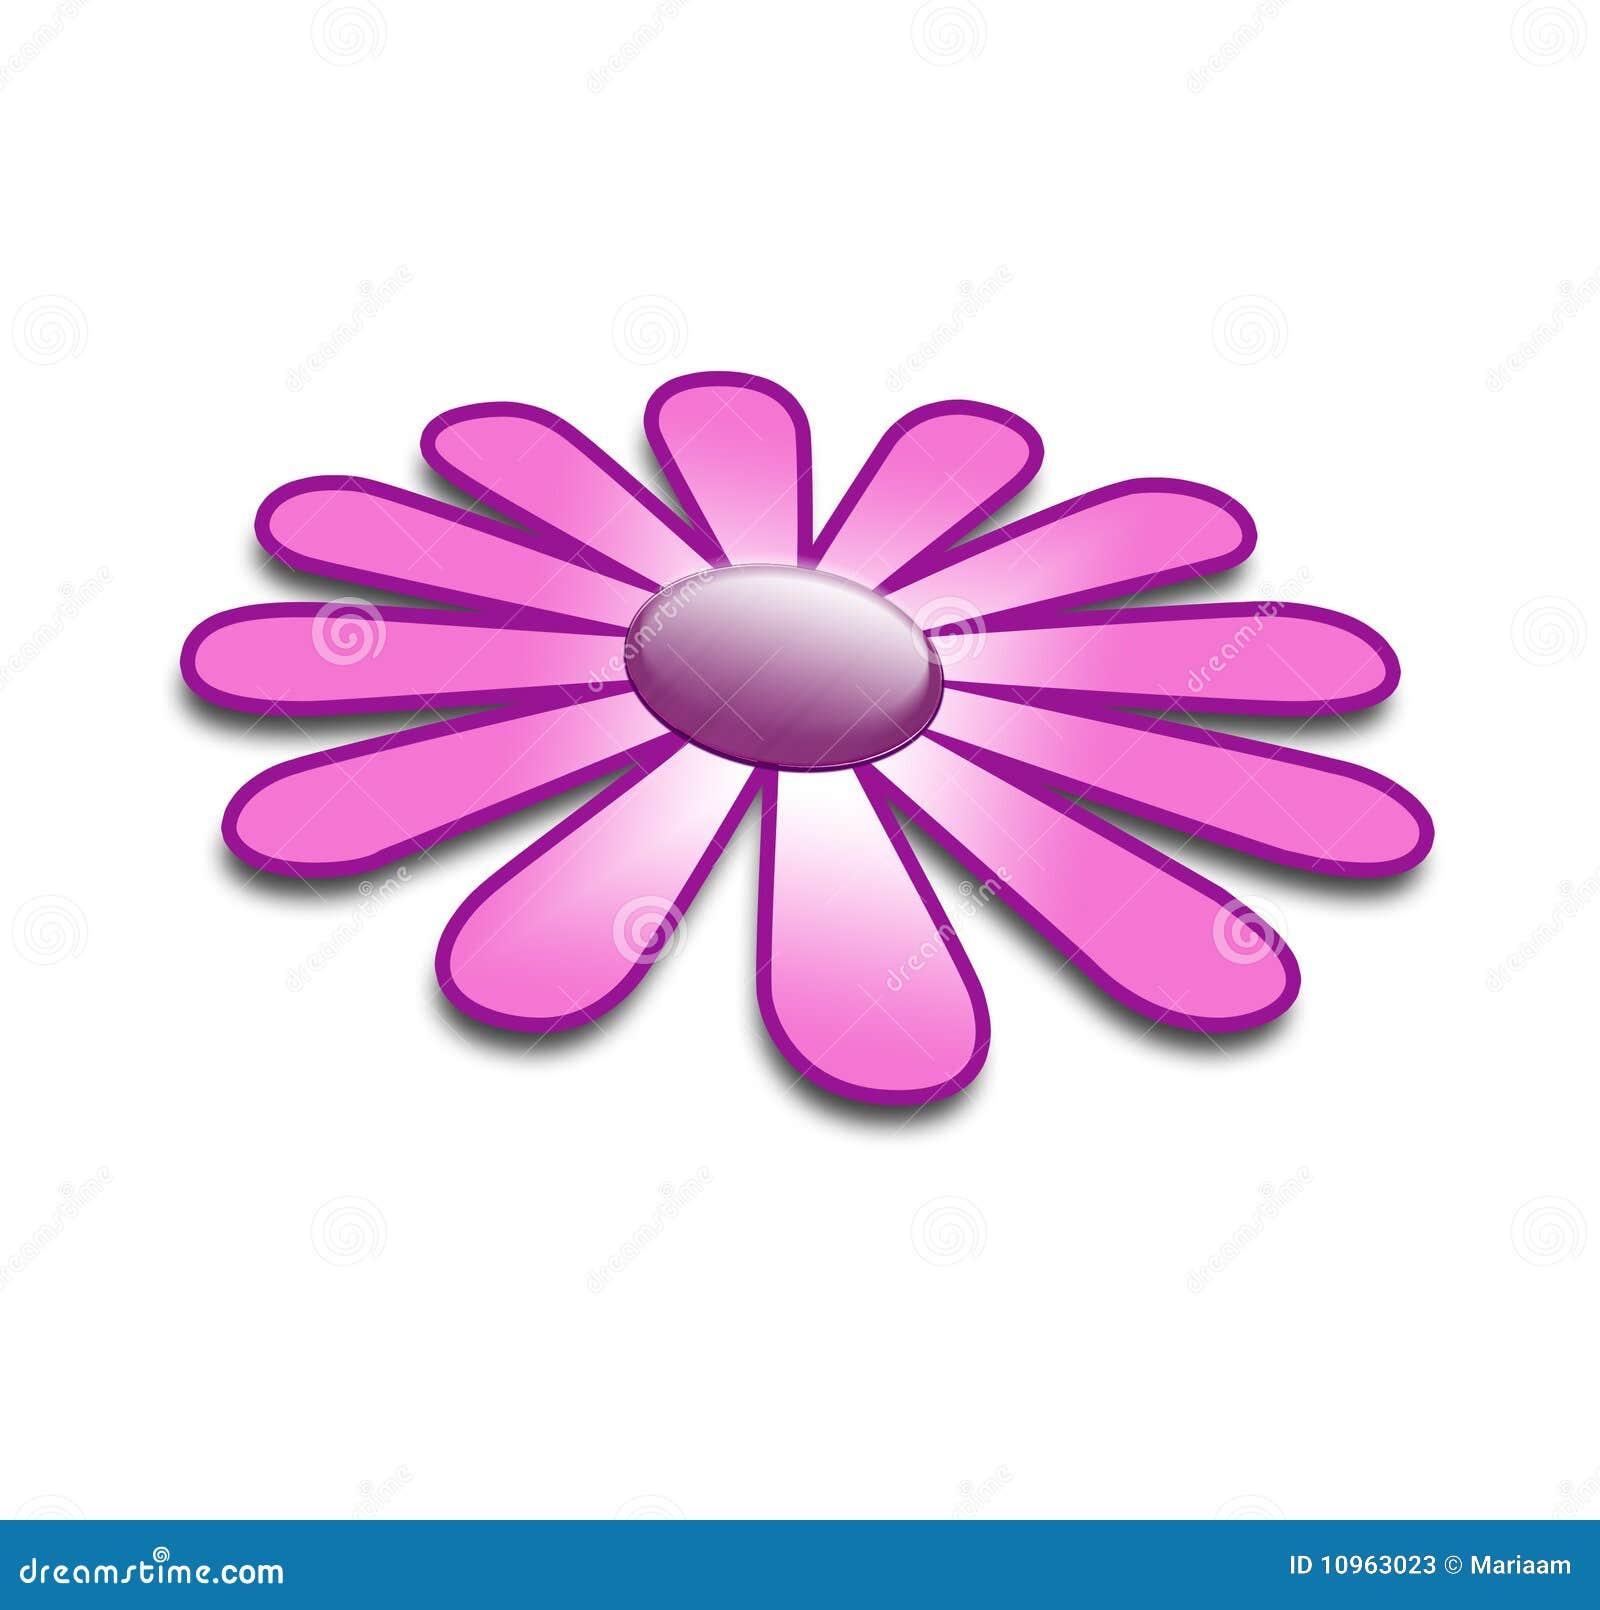 purple flower in 3d stock illustration. illustration of decoration